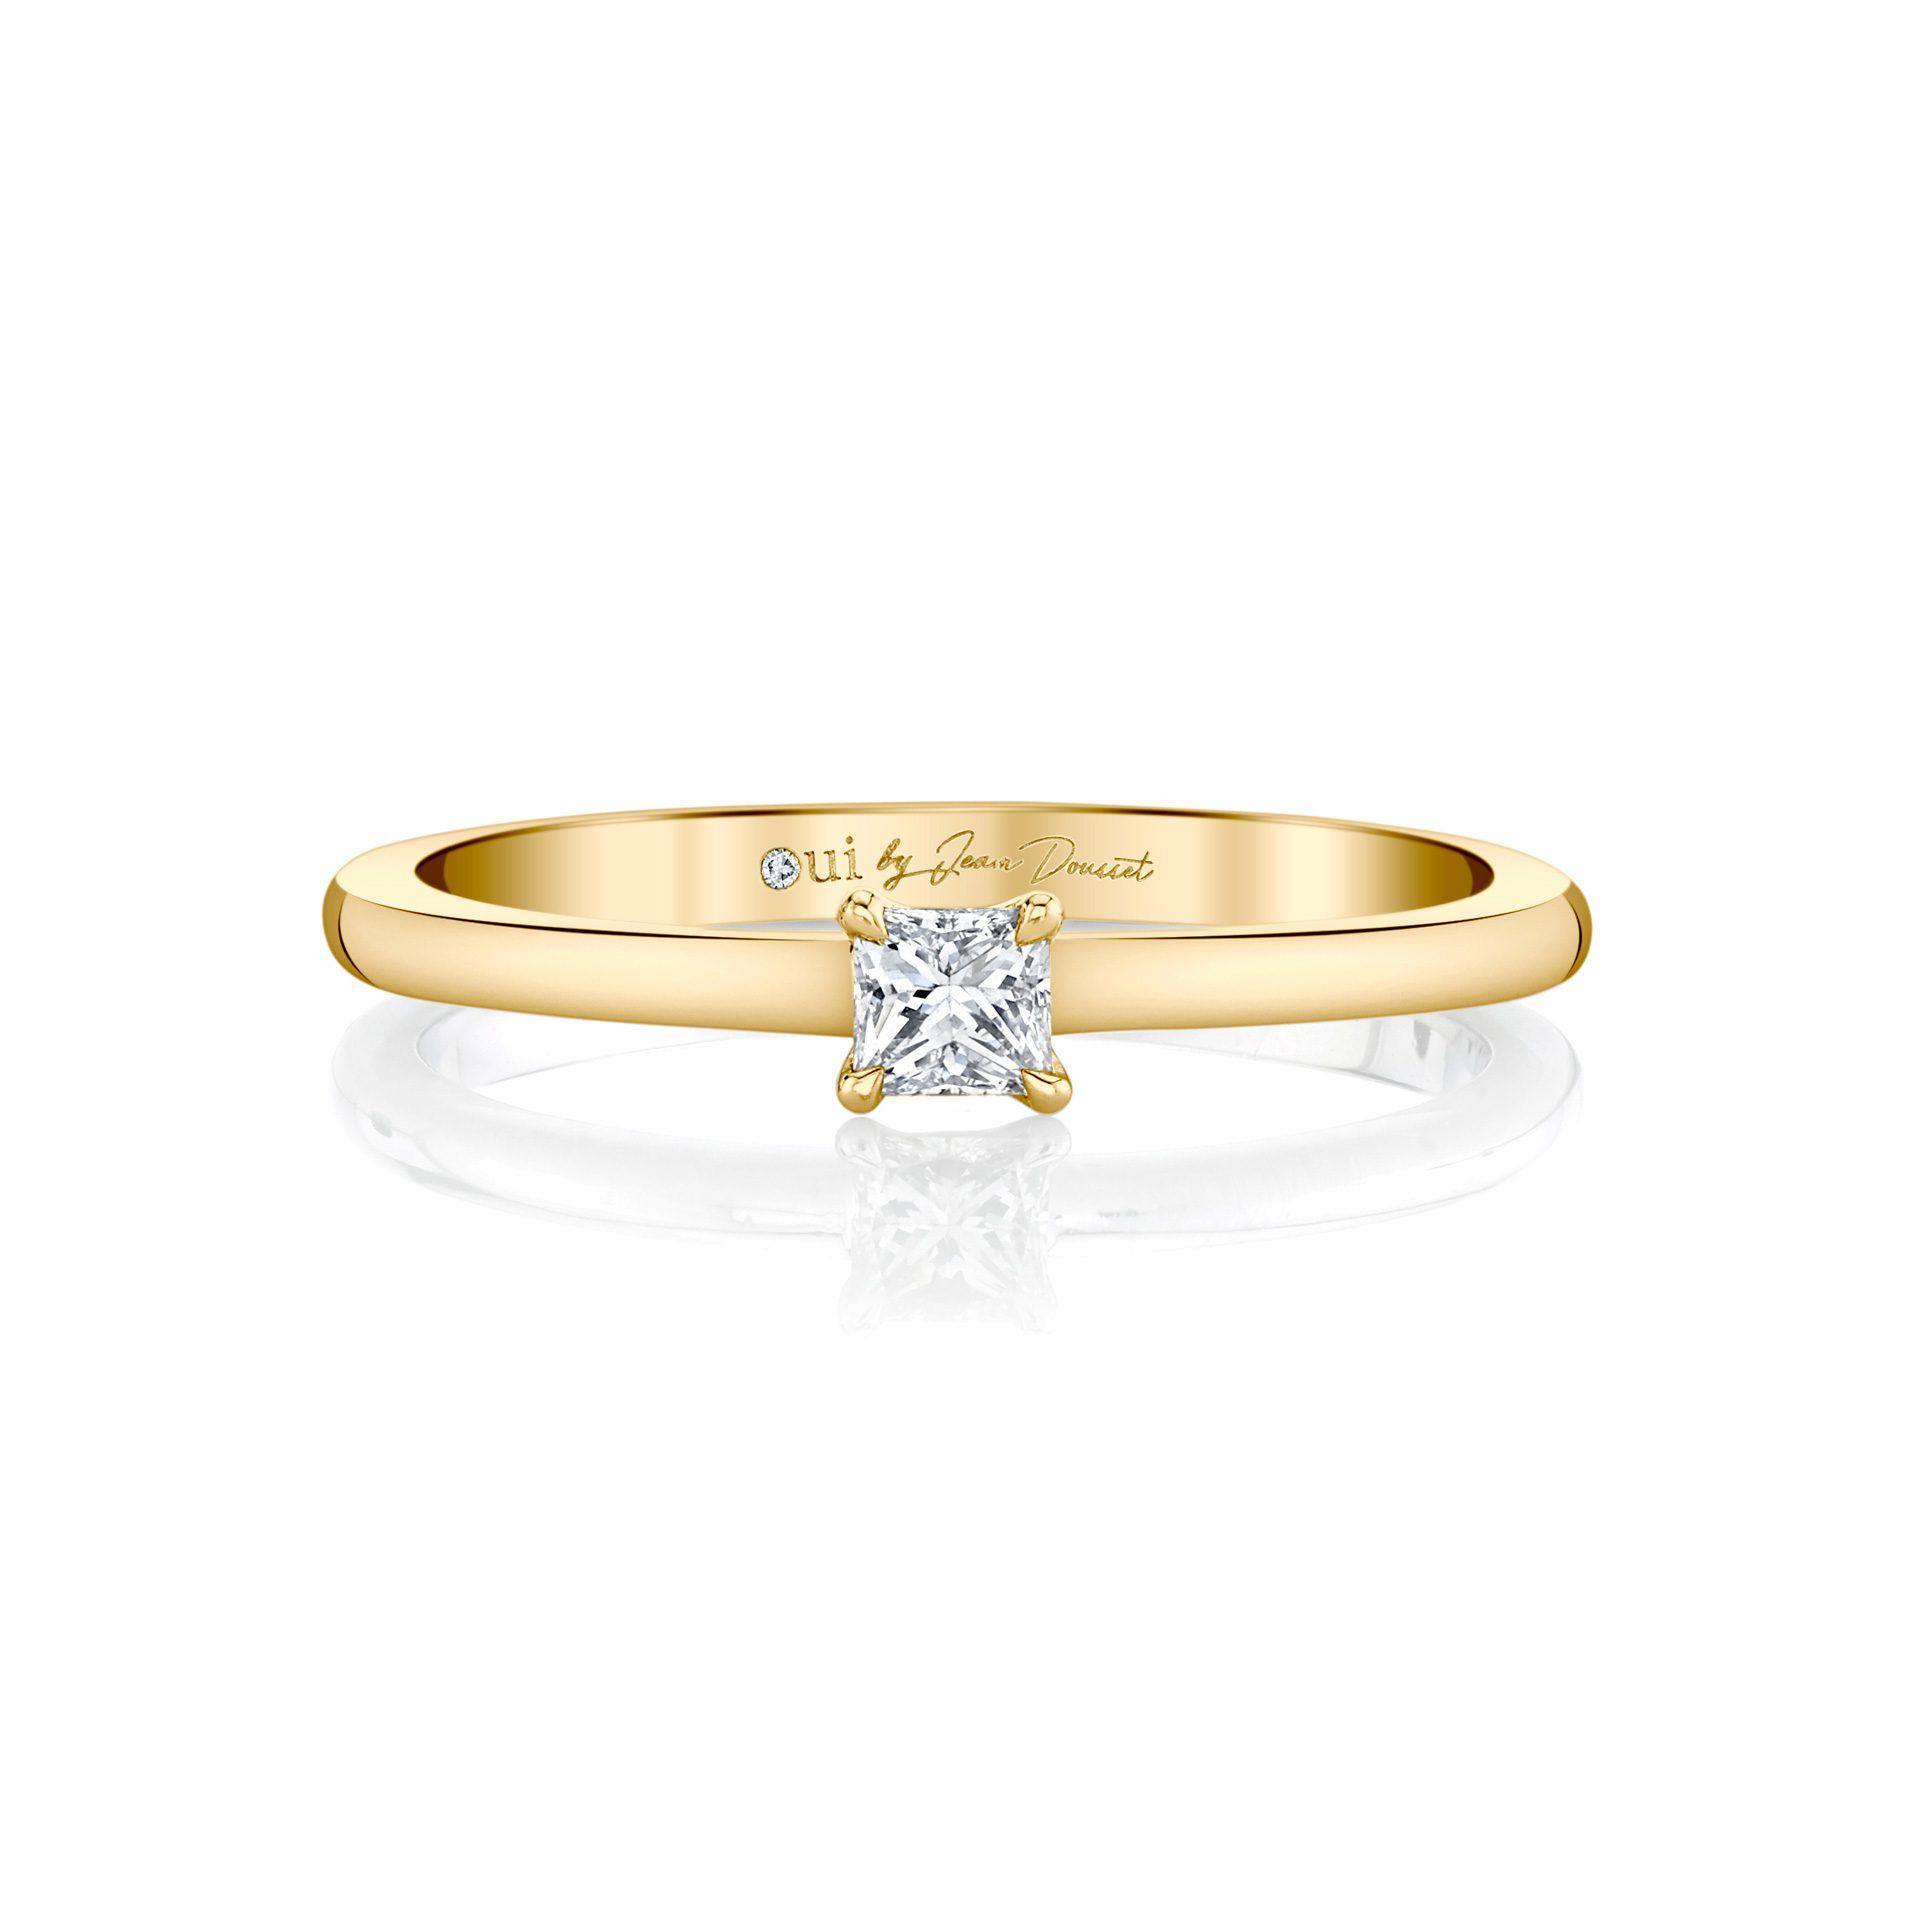 La Petite Princess Diamond Wedding Band in 18k Yellow Gold Front View by Oui by Jean Dousset